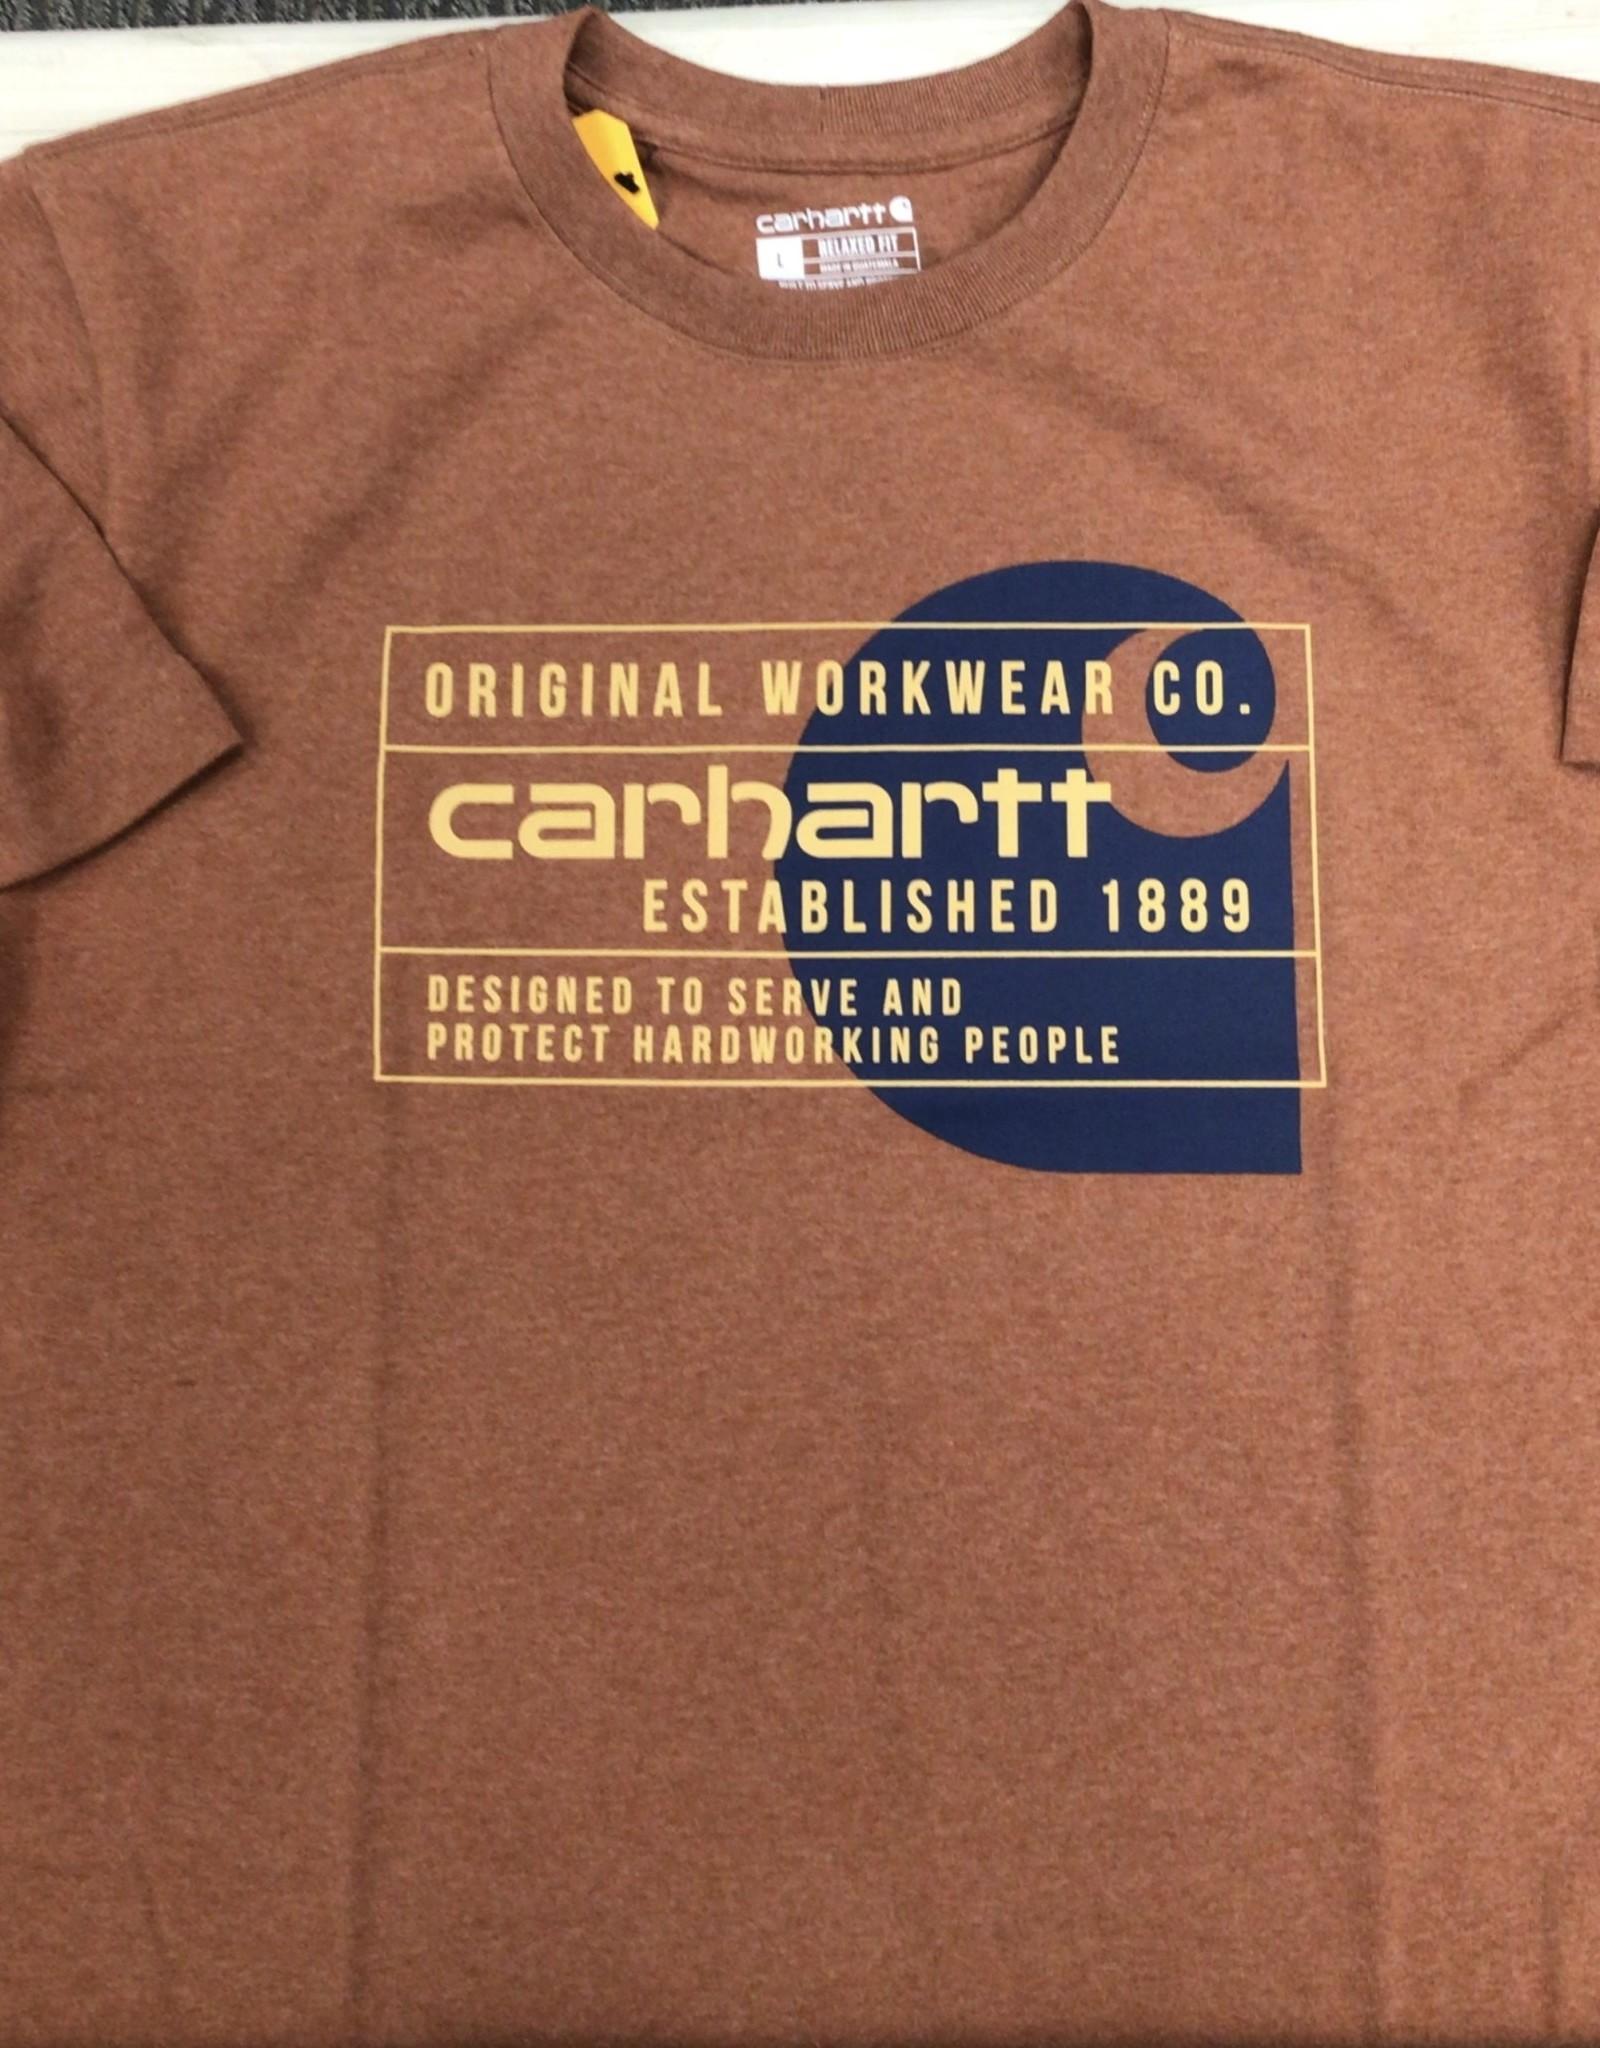 Carhartt Carhartt 104610 Relaxed Fit S/S Workwear Tshirt Men's